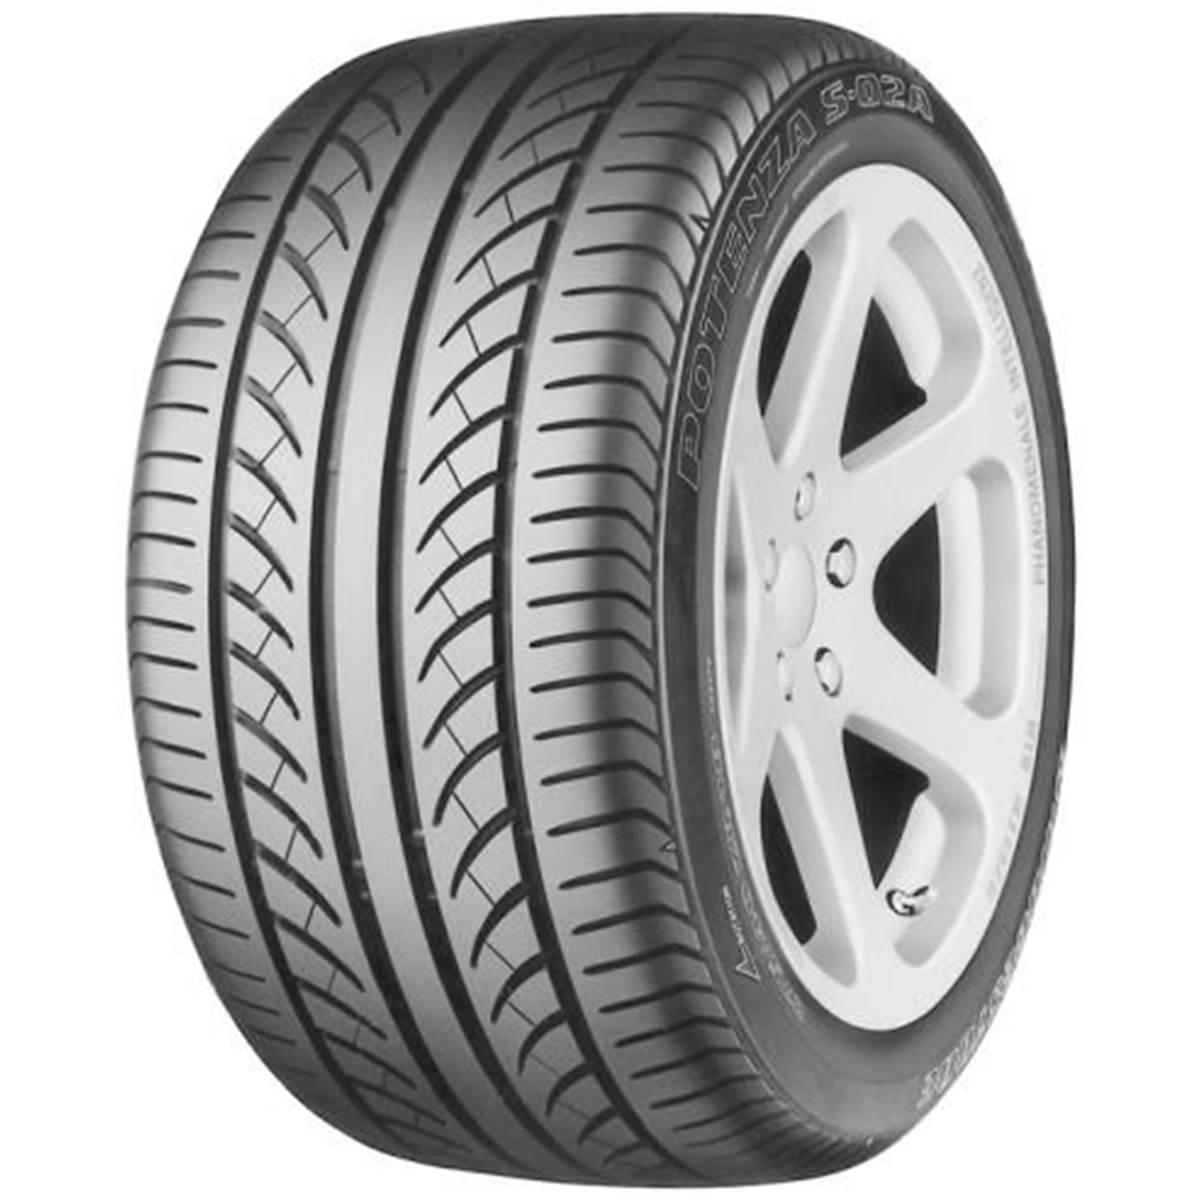 Pneu Bridgestone 225/40R18 Z Potenza S02A